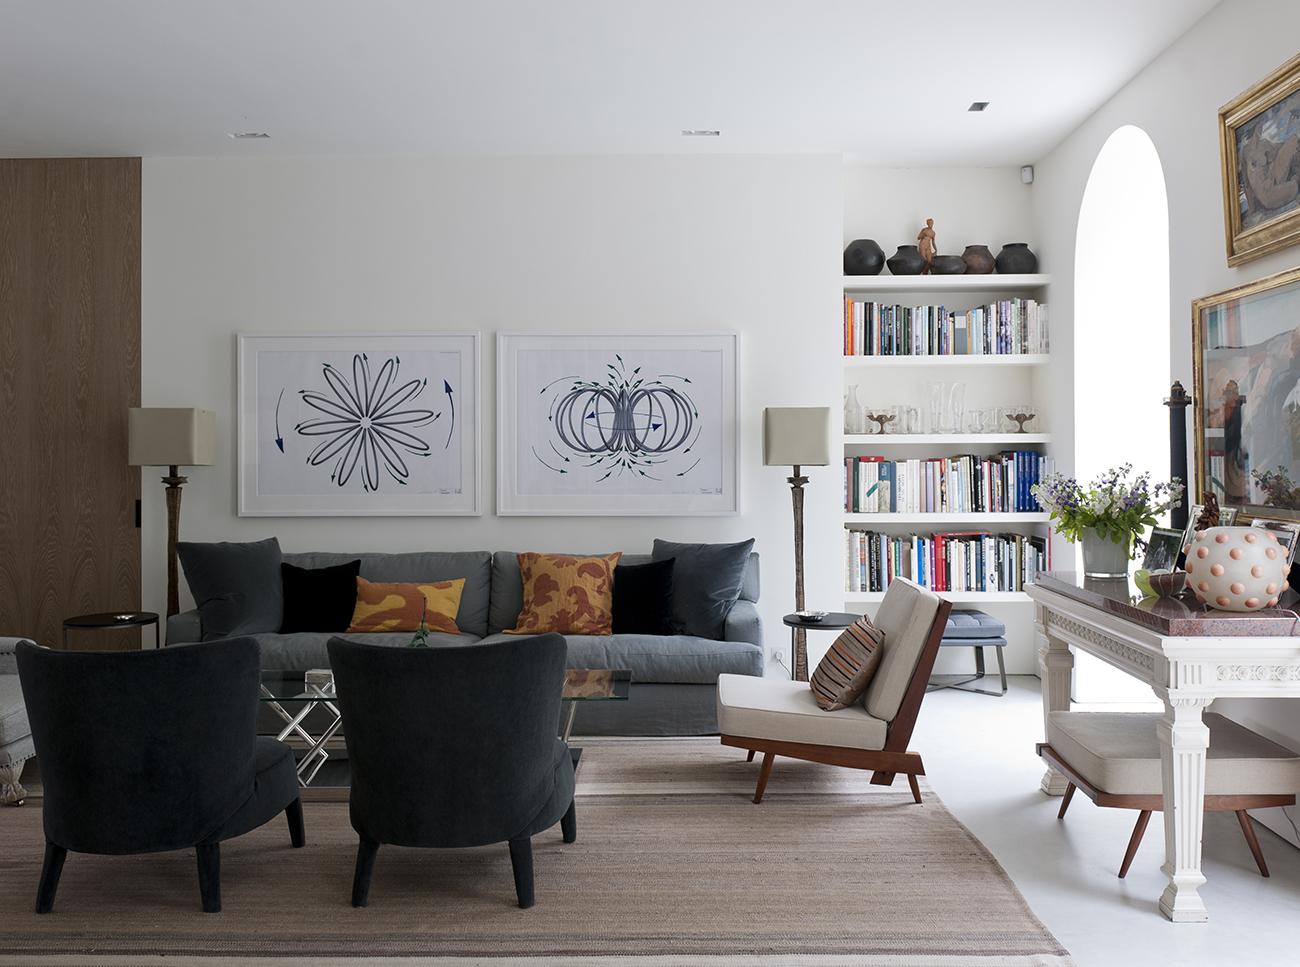 Mews-4-London-Hyde-Park-Andy-Martin-Architects-LG7.jpg